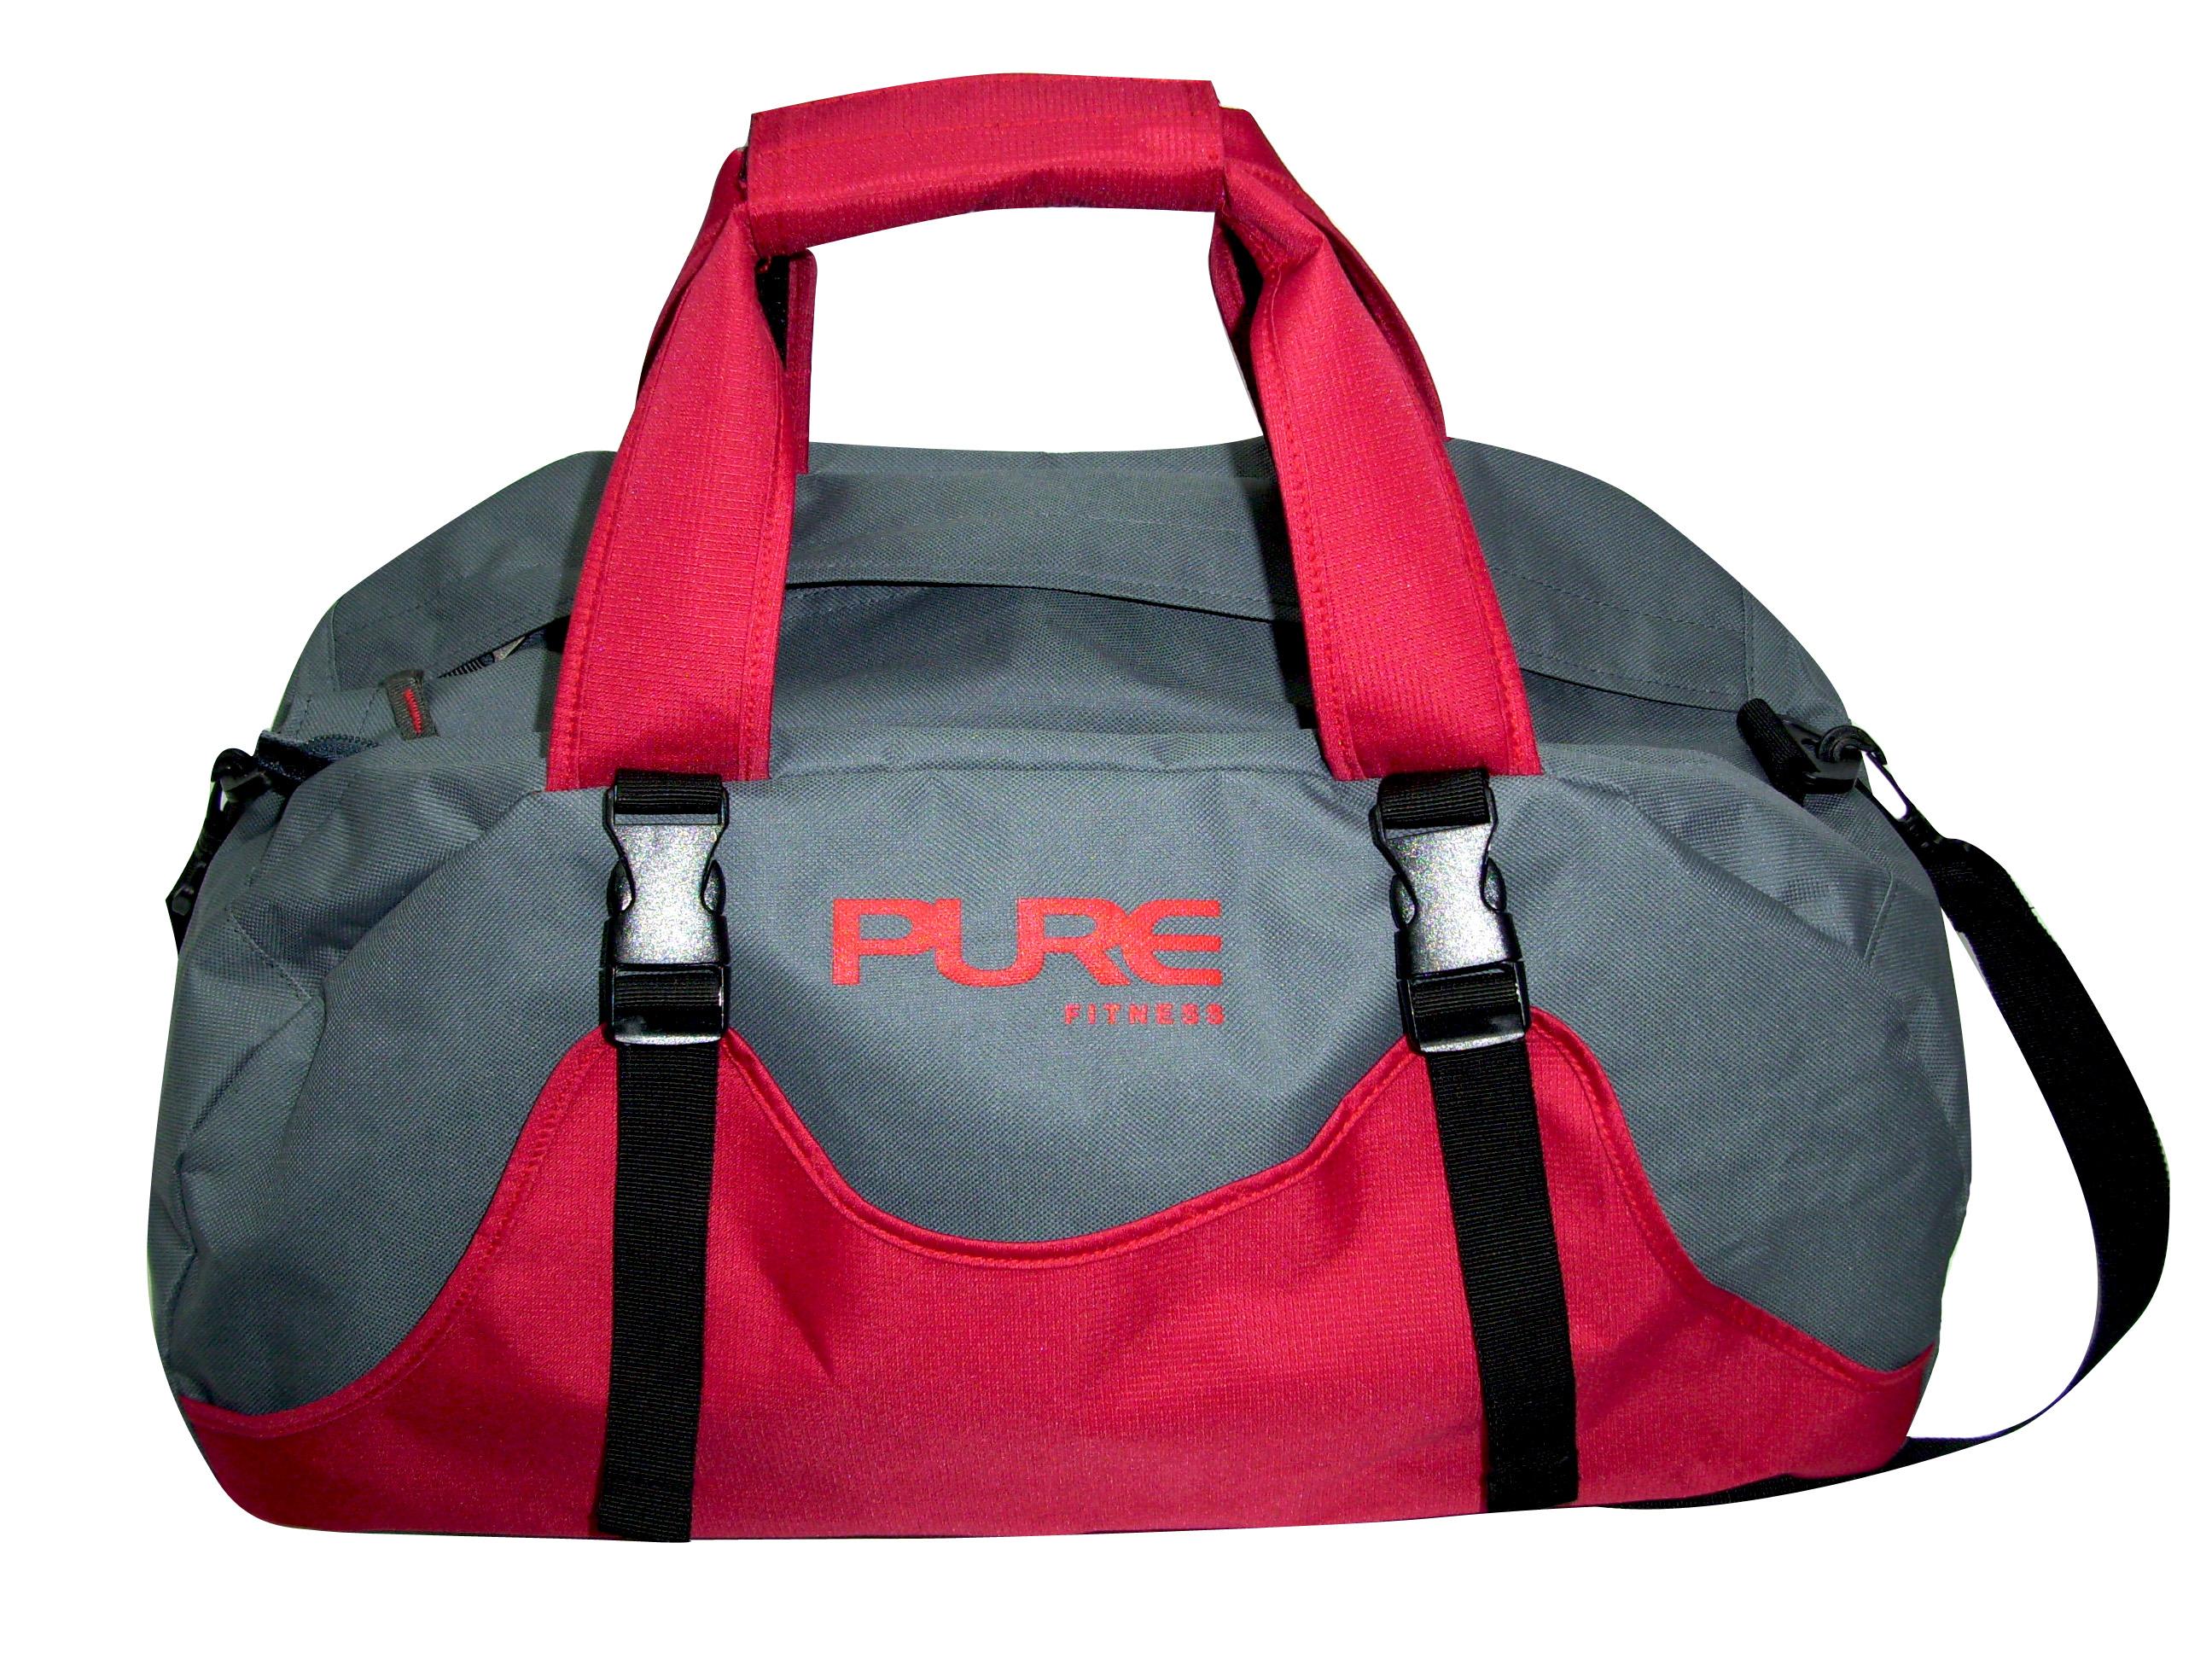 Gift & Premium - Sport Bag 02